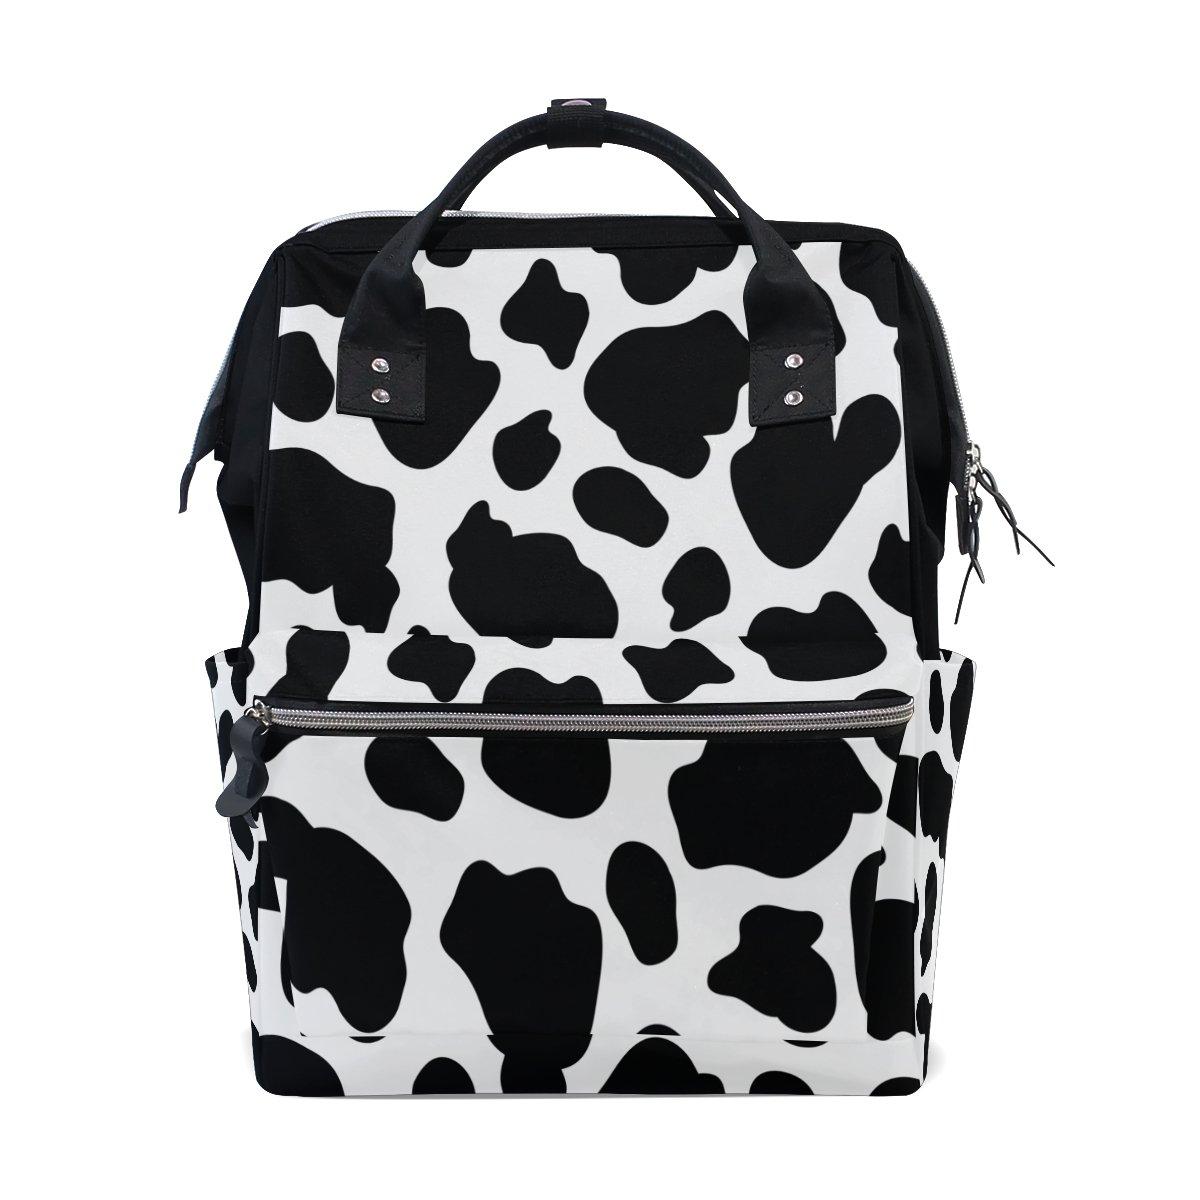 WOZO Cow Print Multi-function Diaper Bags Backpack Travel Bag